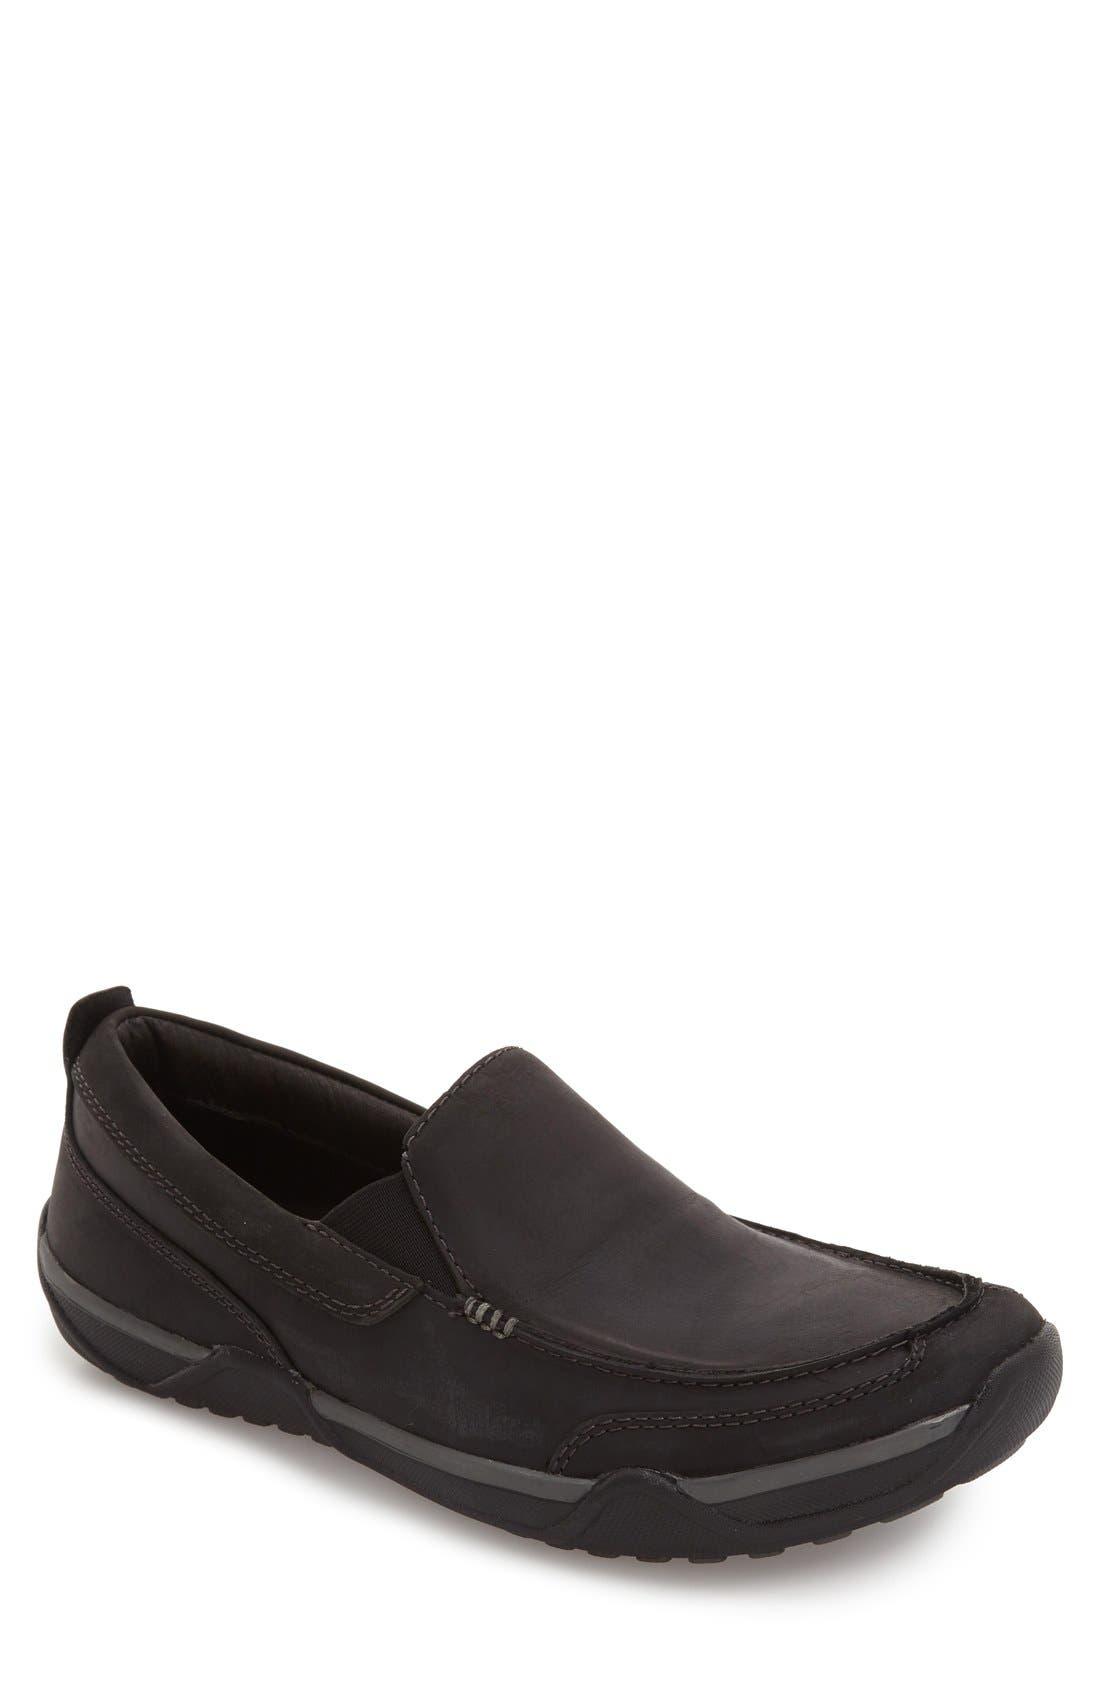 Markis Moc Toe Slip-On,                             Main thumbnail 1, color,                             Black Leather